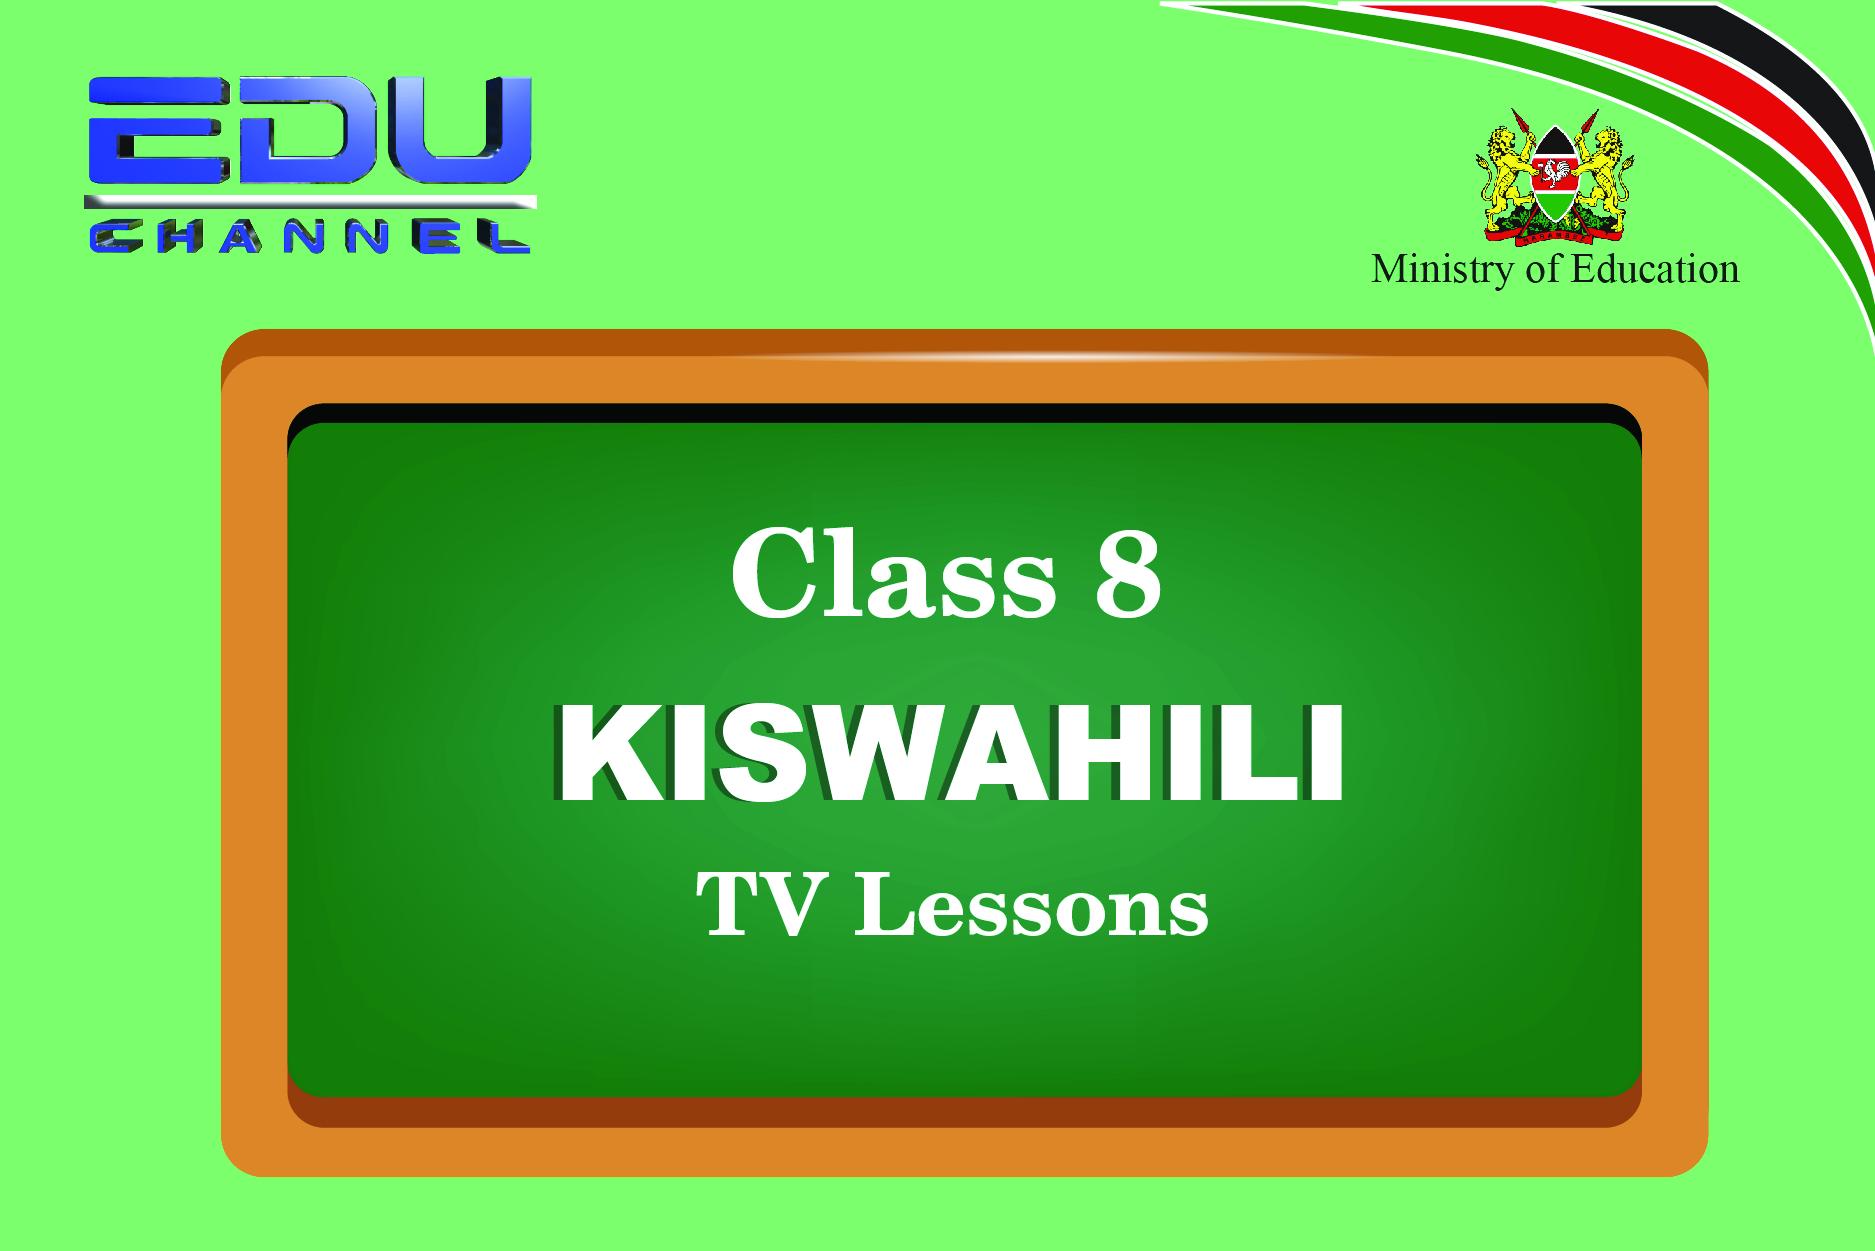 Standard 8  Kiswahili Lesson 3: Vivumishi Sarufi